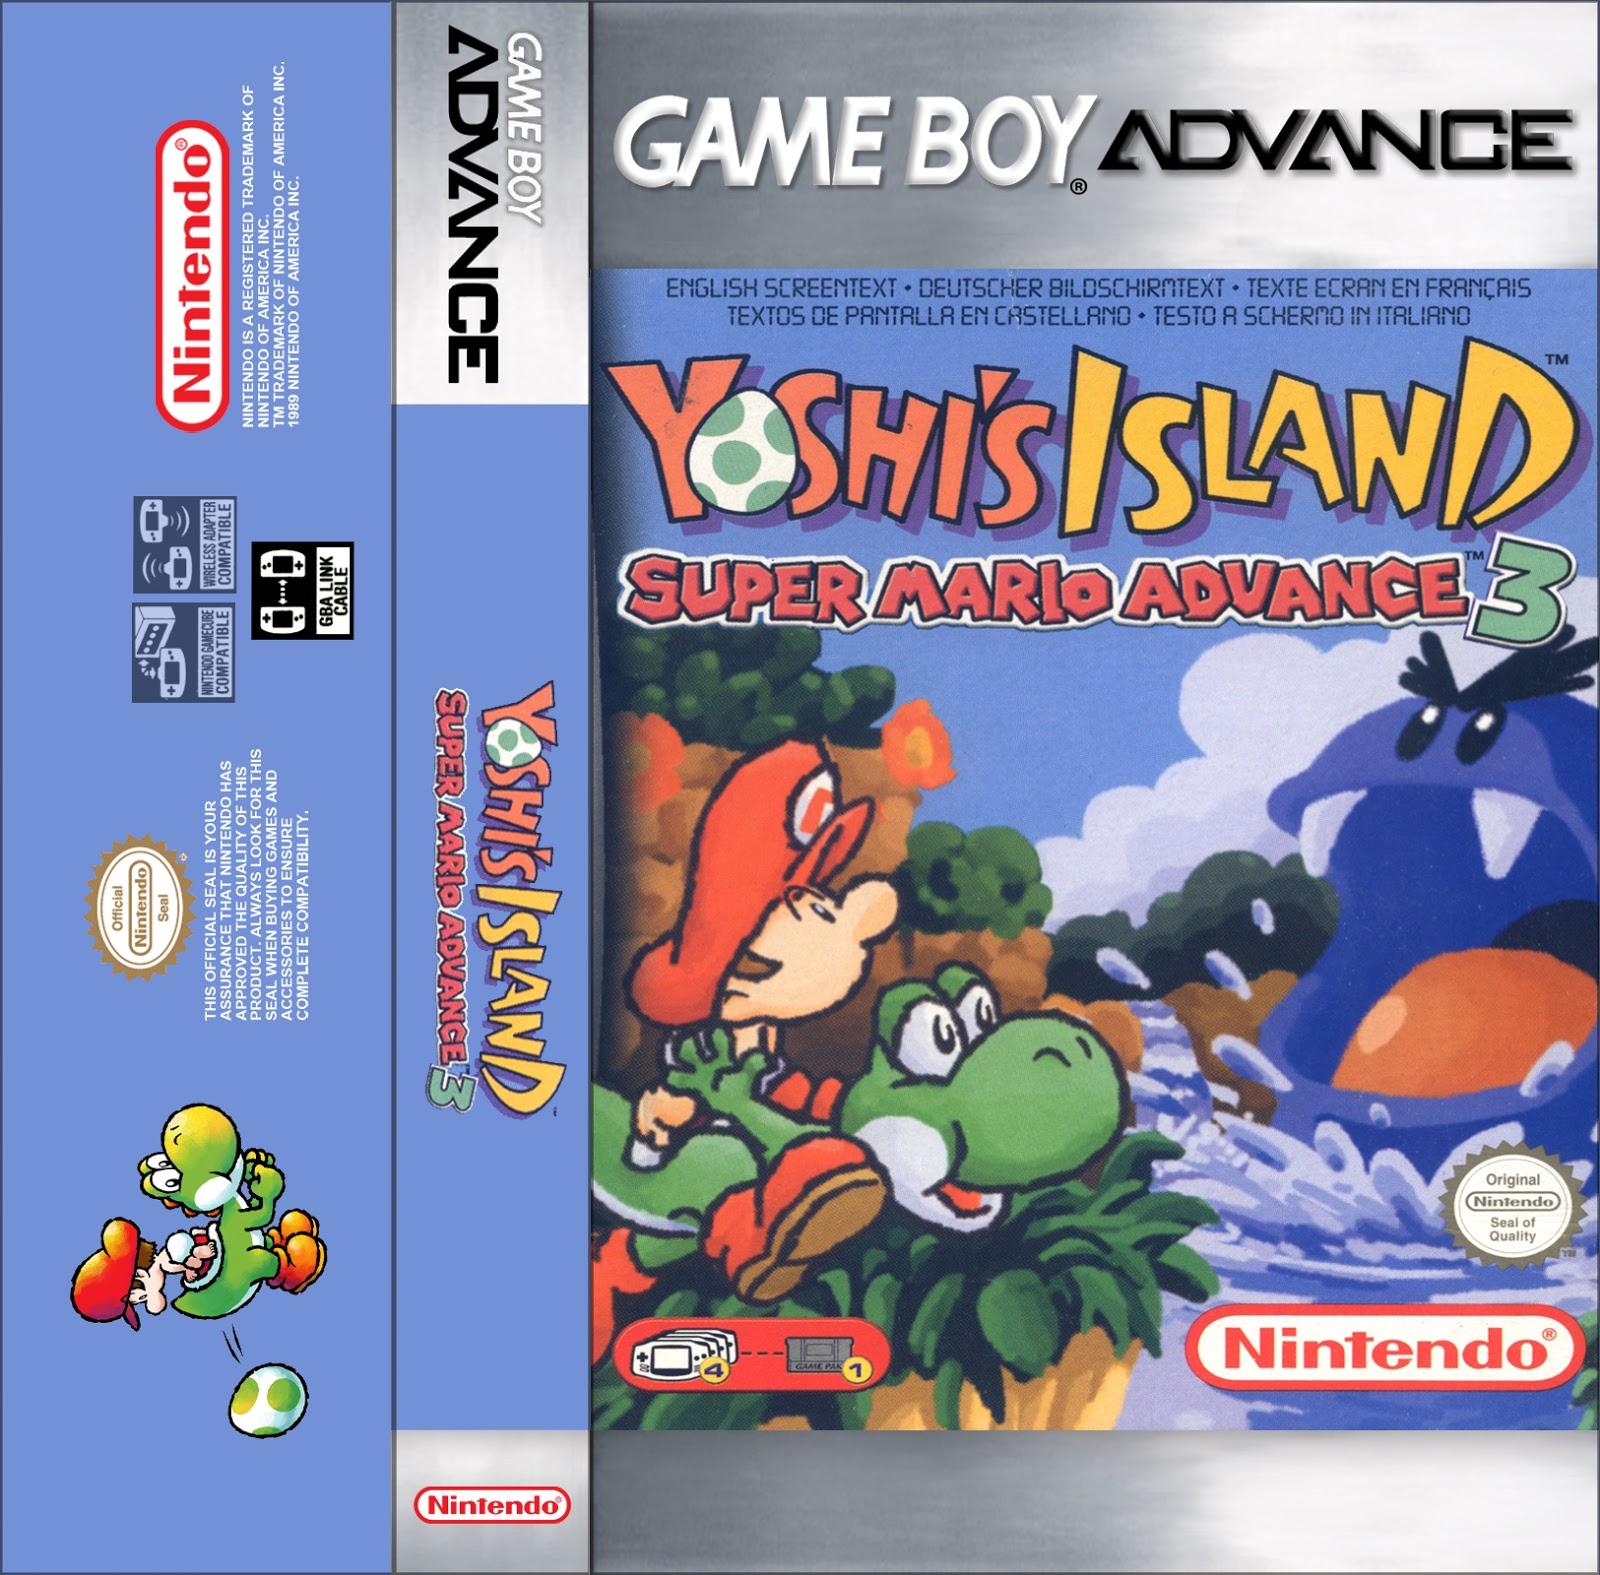 Game boy color super mario bros deluxe - Super Mario Advance 3 Yoshi S Island Game Boy Advance Cassette Cover